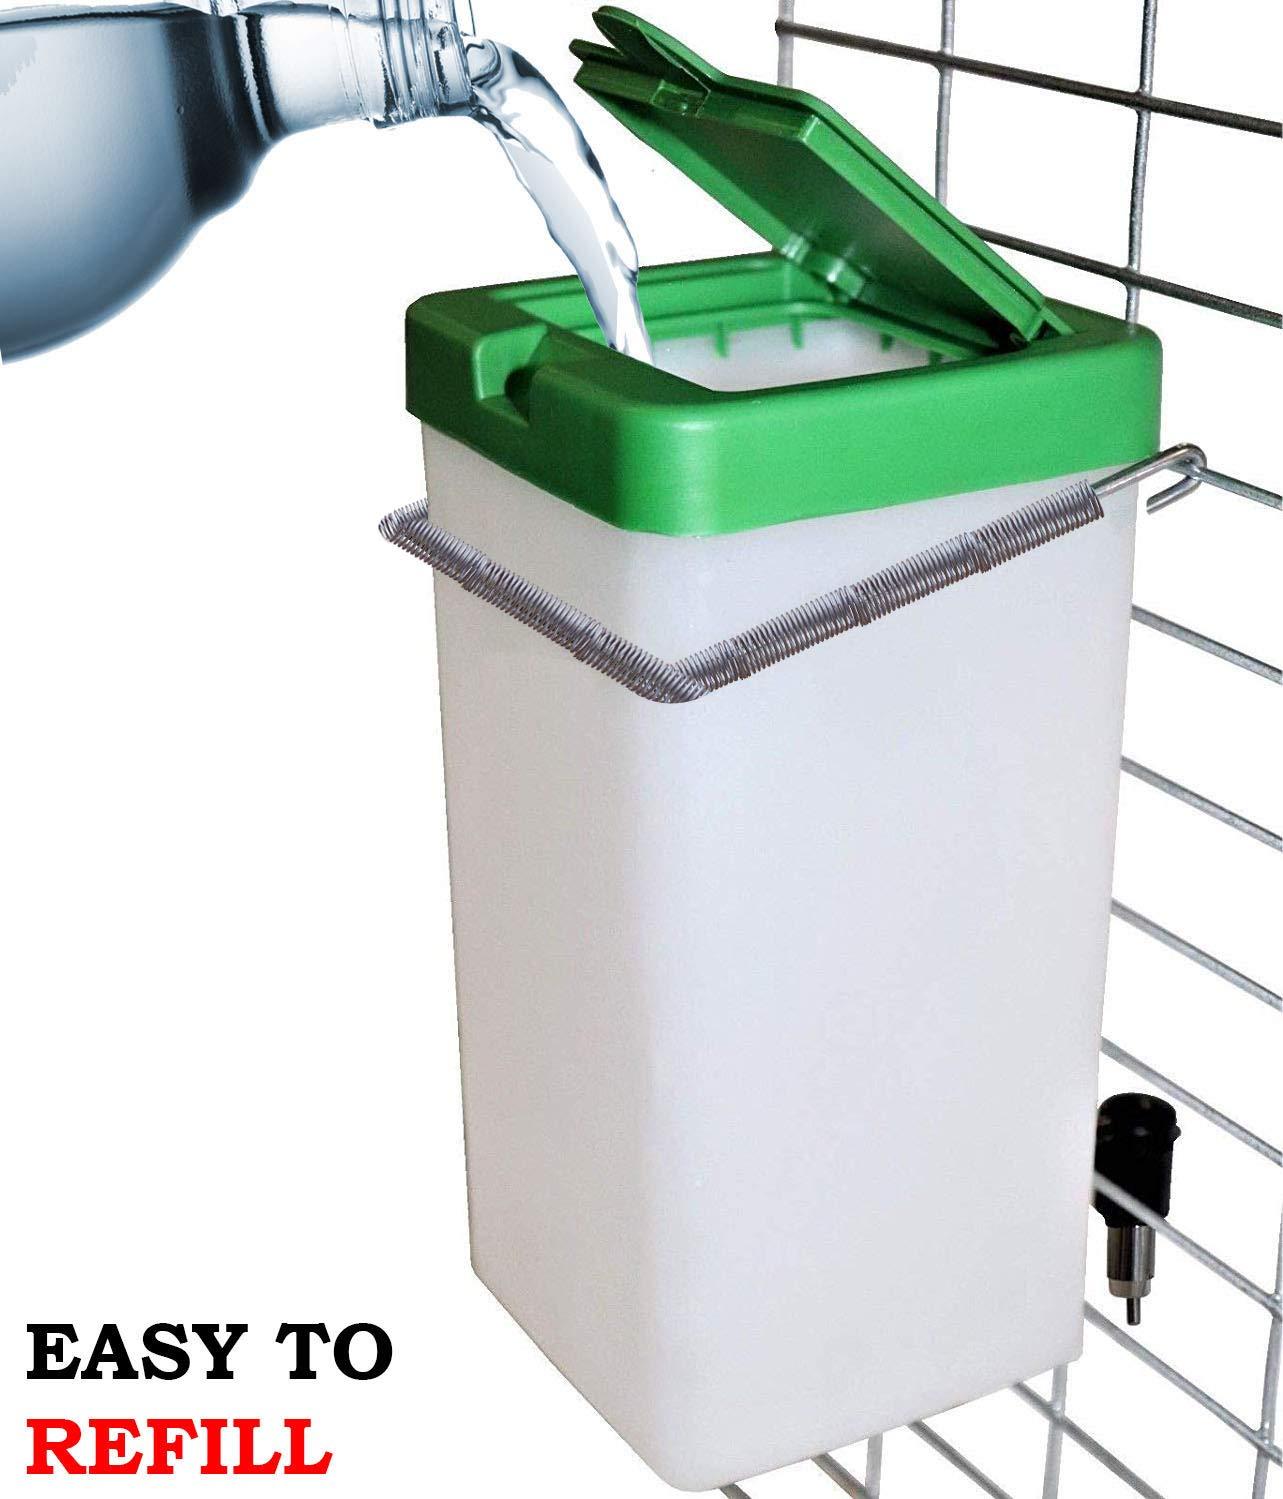 Cruzadel 32 oz Non-Drip Small Animal Water Bottle. Direct Refillable Water Dispenser for Small Pet (Rabbit/Hamster/Guinea Pig/Bunny/Ferret) by Cruzadel